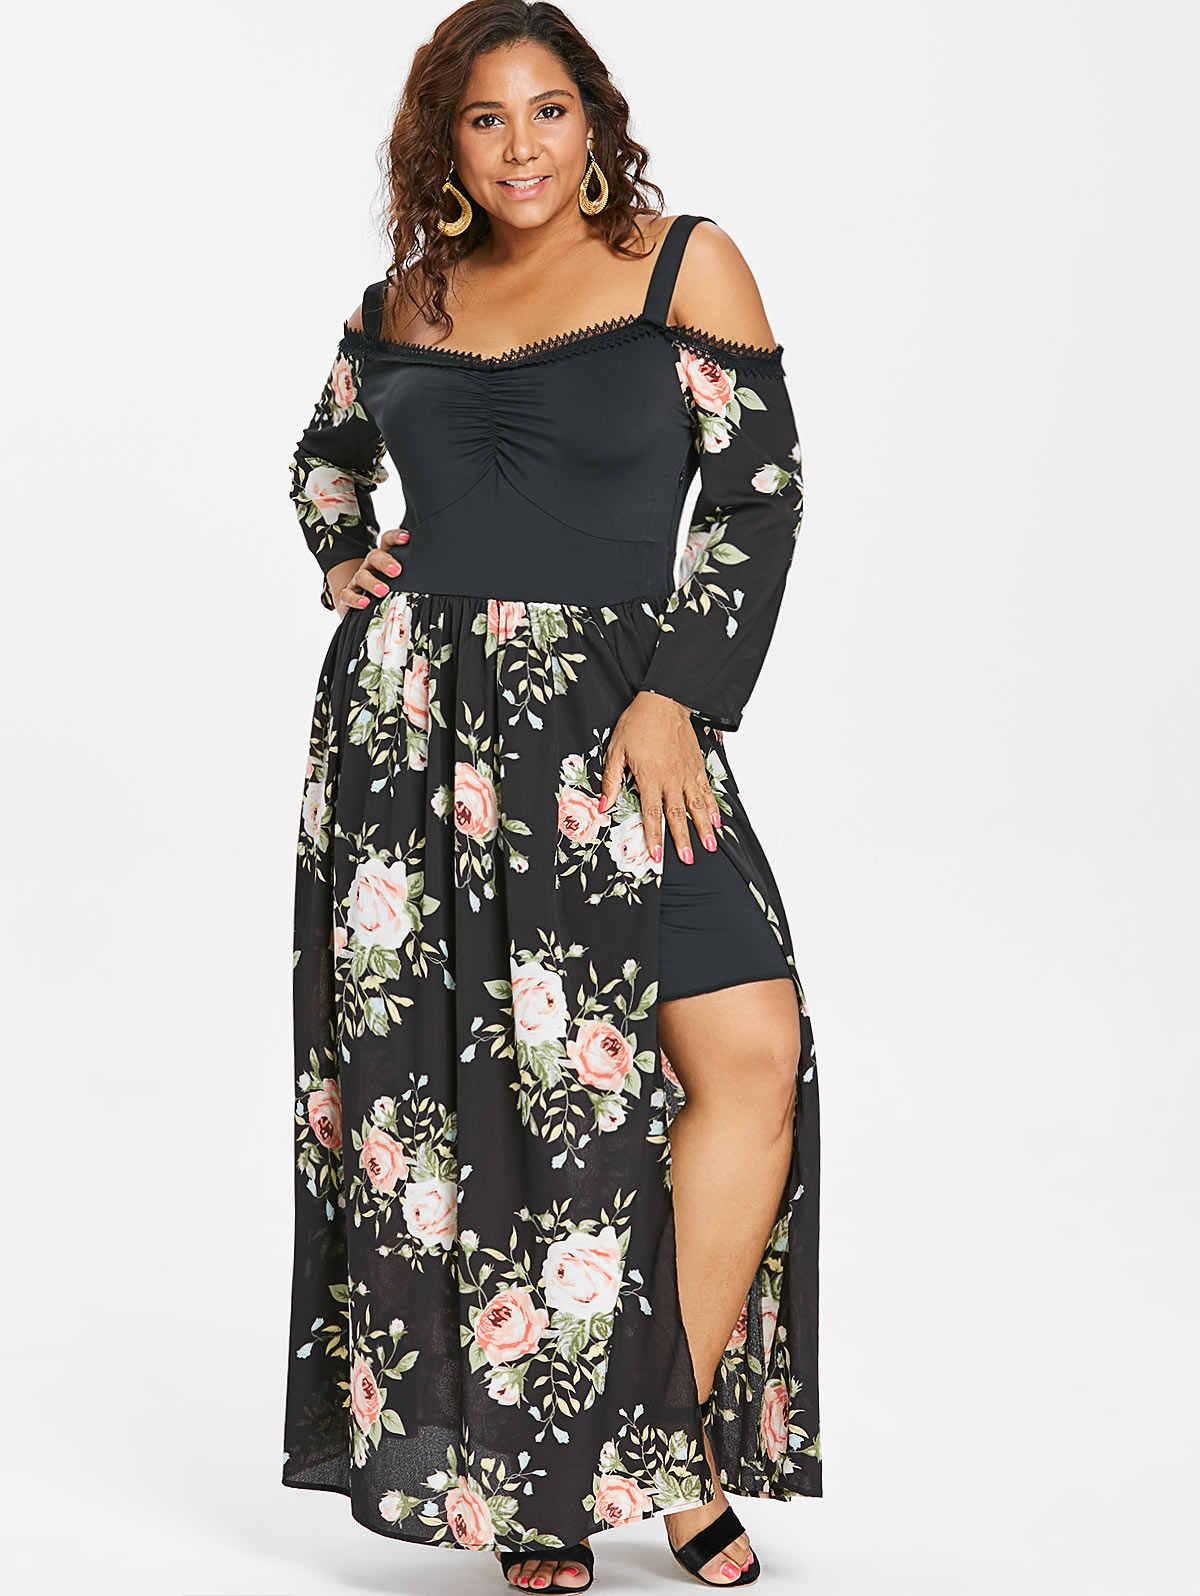 Rosegal Plus Size Cold Shoulder Floral High Split Maxi Dress Women Party  Dress Autumn Sweetheart Neck Long Sleeves Robe Dresses